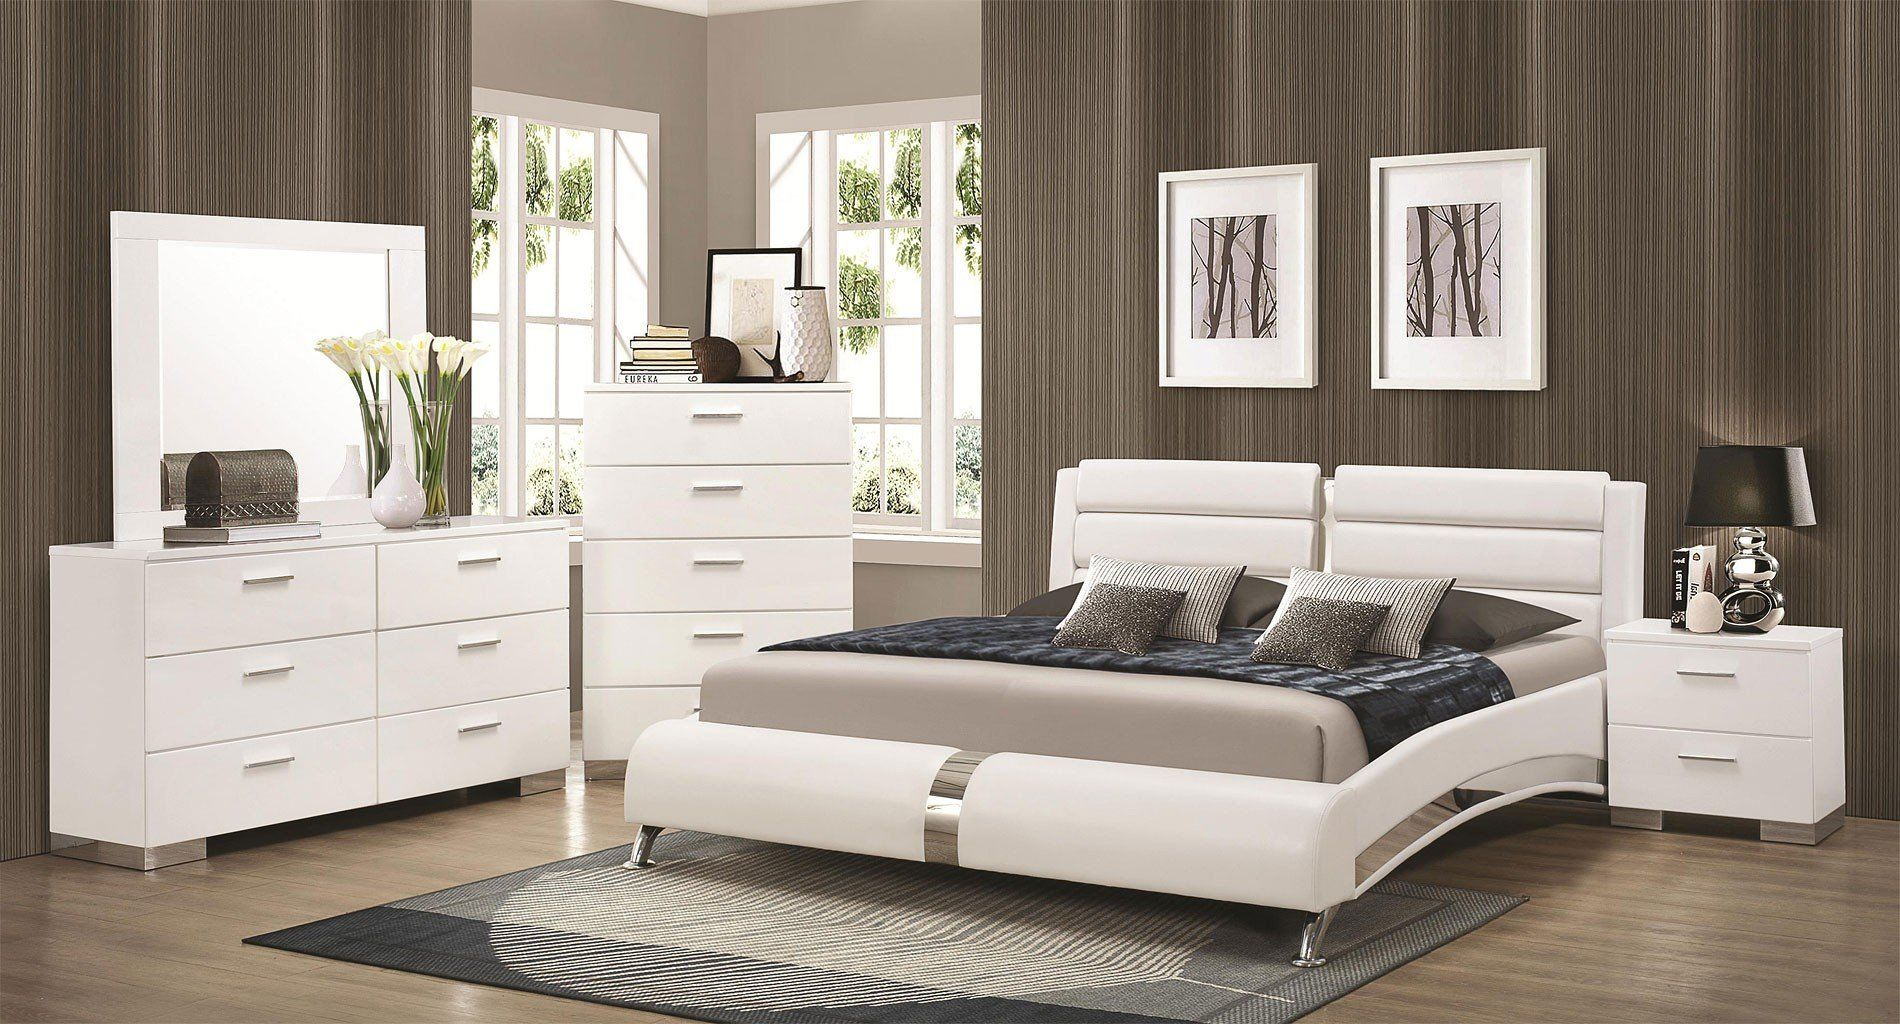 Black Contemporary Bedroom Set Pleasing Felicitybedroomsetwjeremainebedwhite  My Style  Pinterest Decorating Design